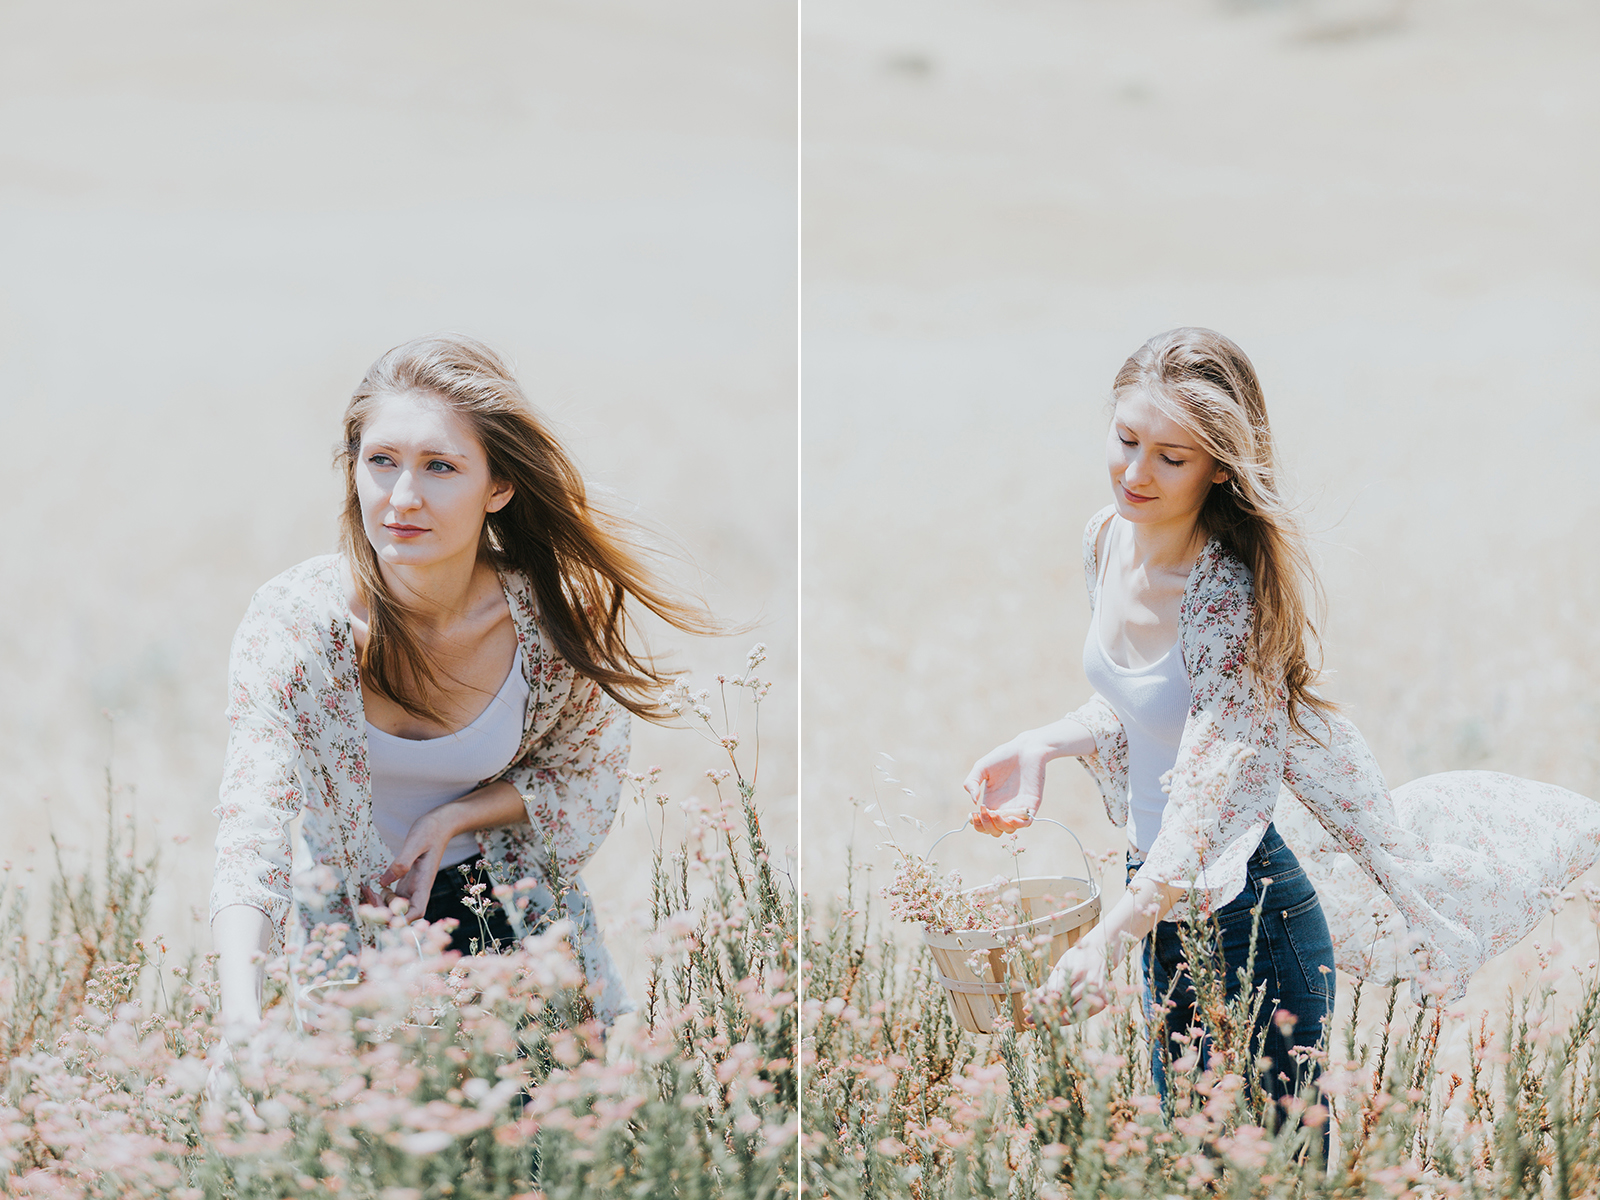 portrait-photographer-fields-orange-county-ca-hannah-1